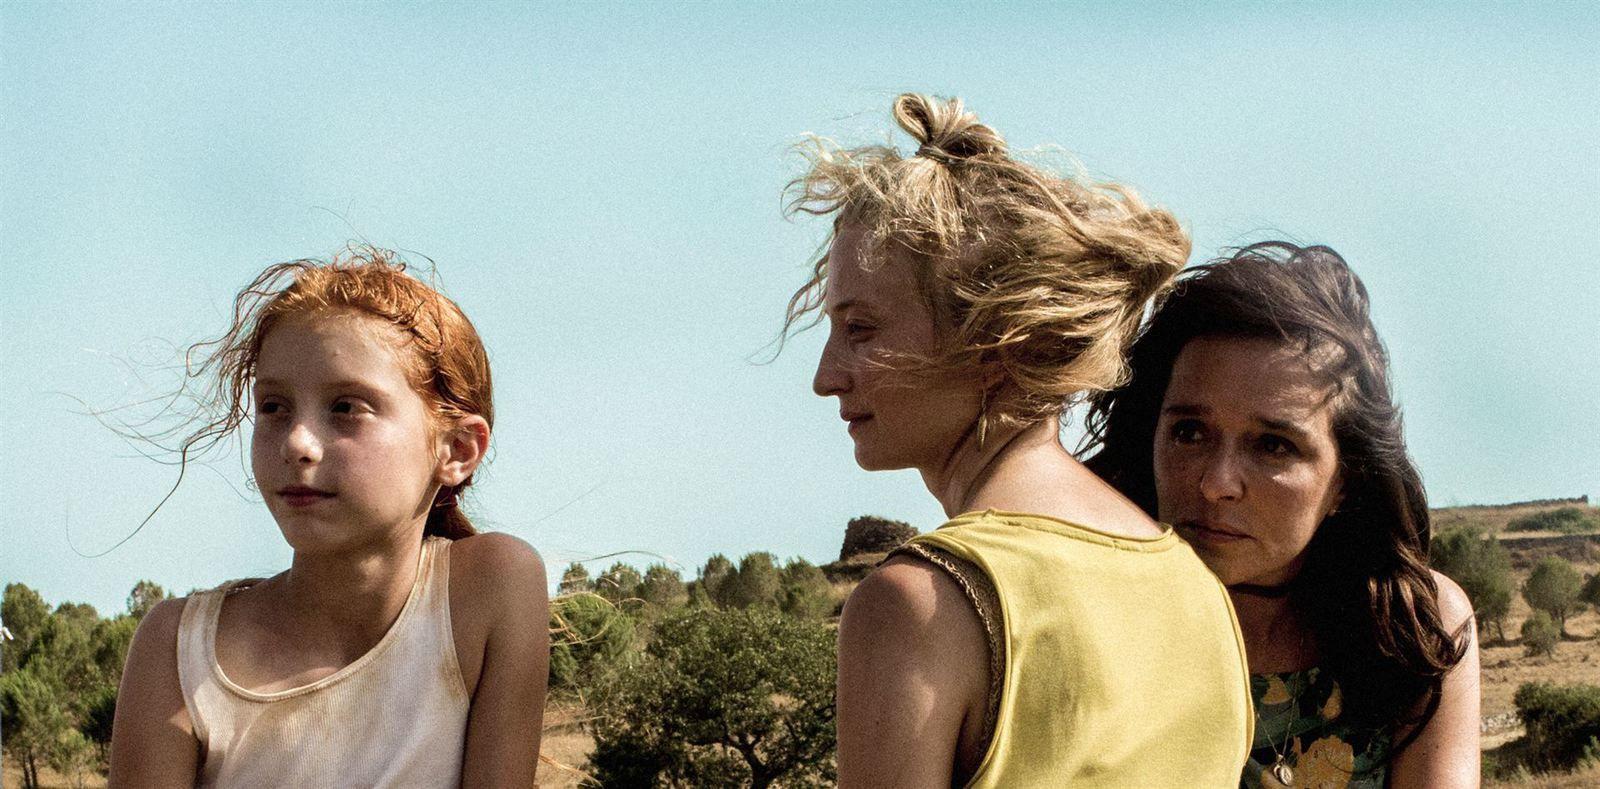 MA FILLE (BANDE-ANNONCE) avec Valeria Golino, Alba Rohrwacher - Le 27 juin 2018 au cinéma